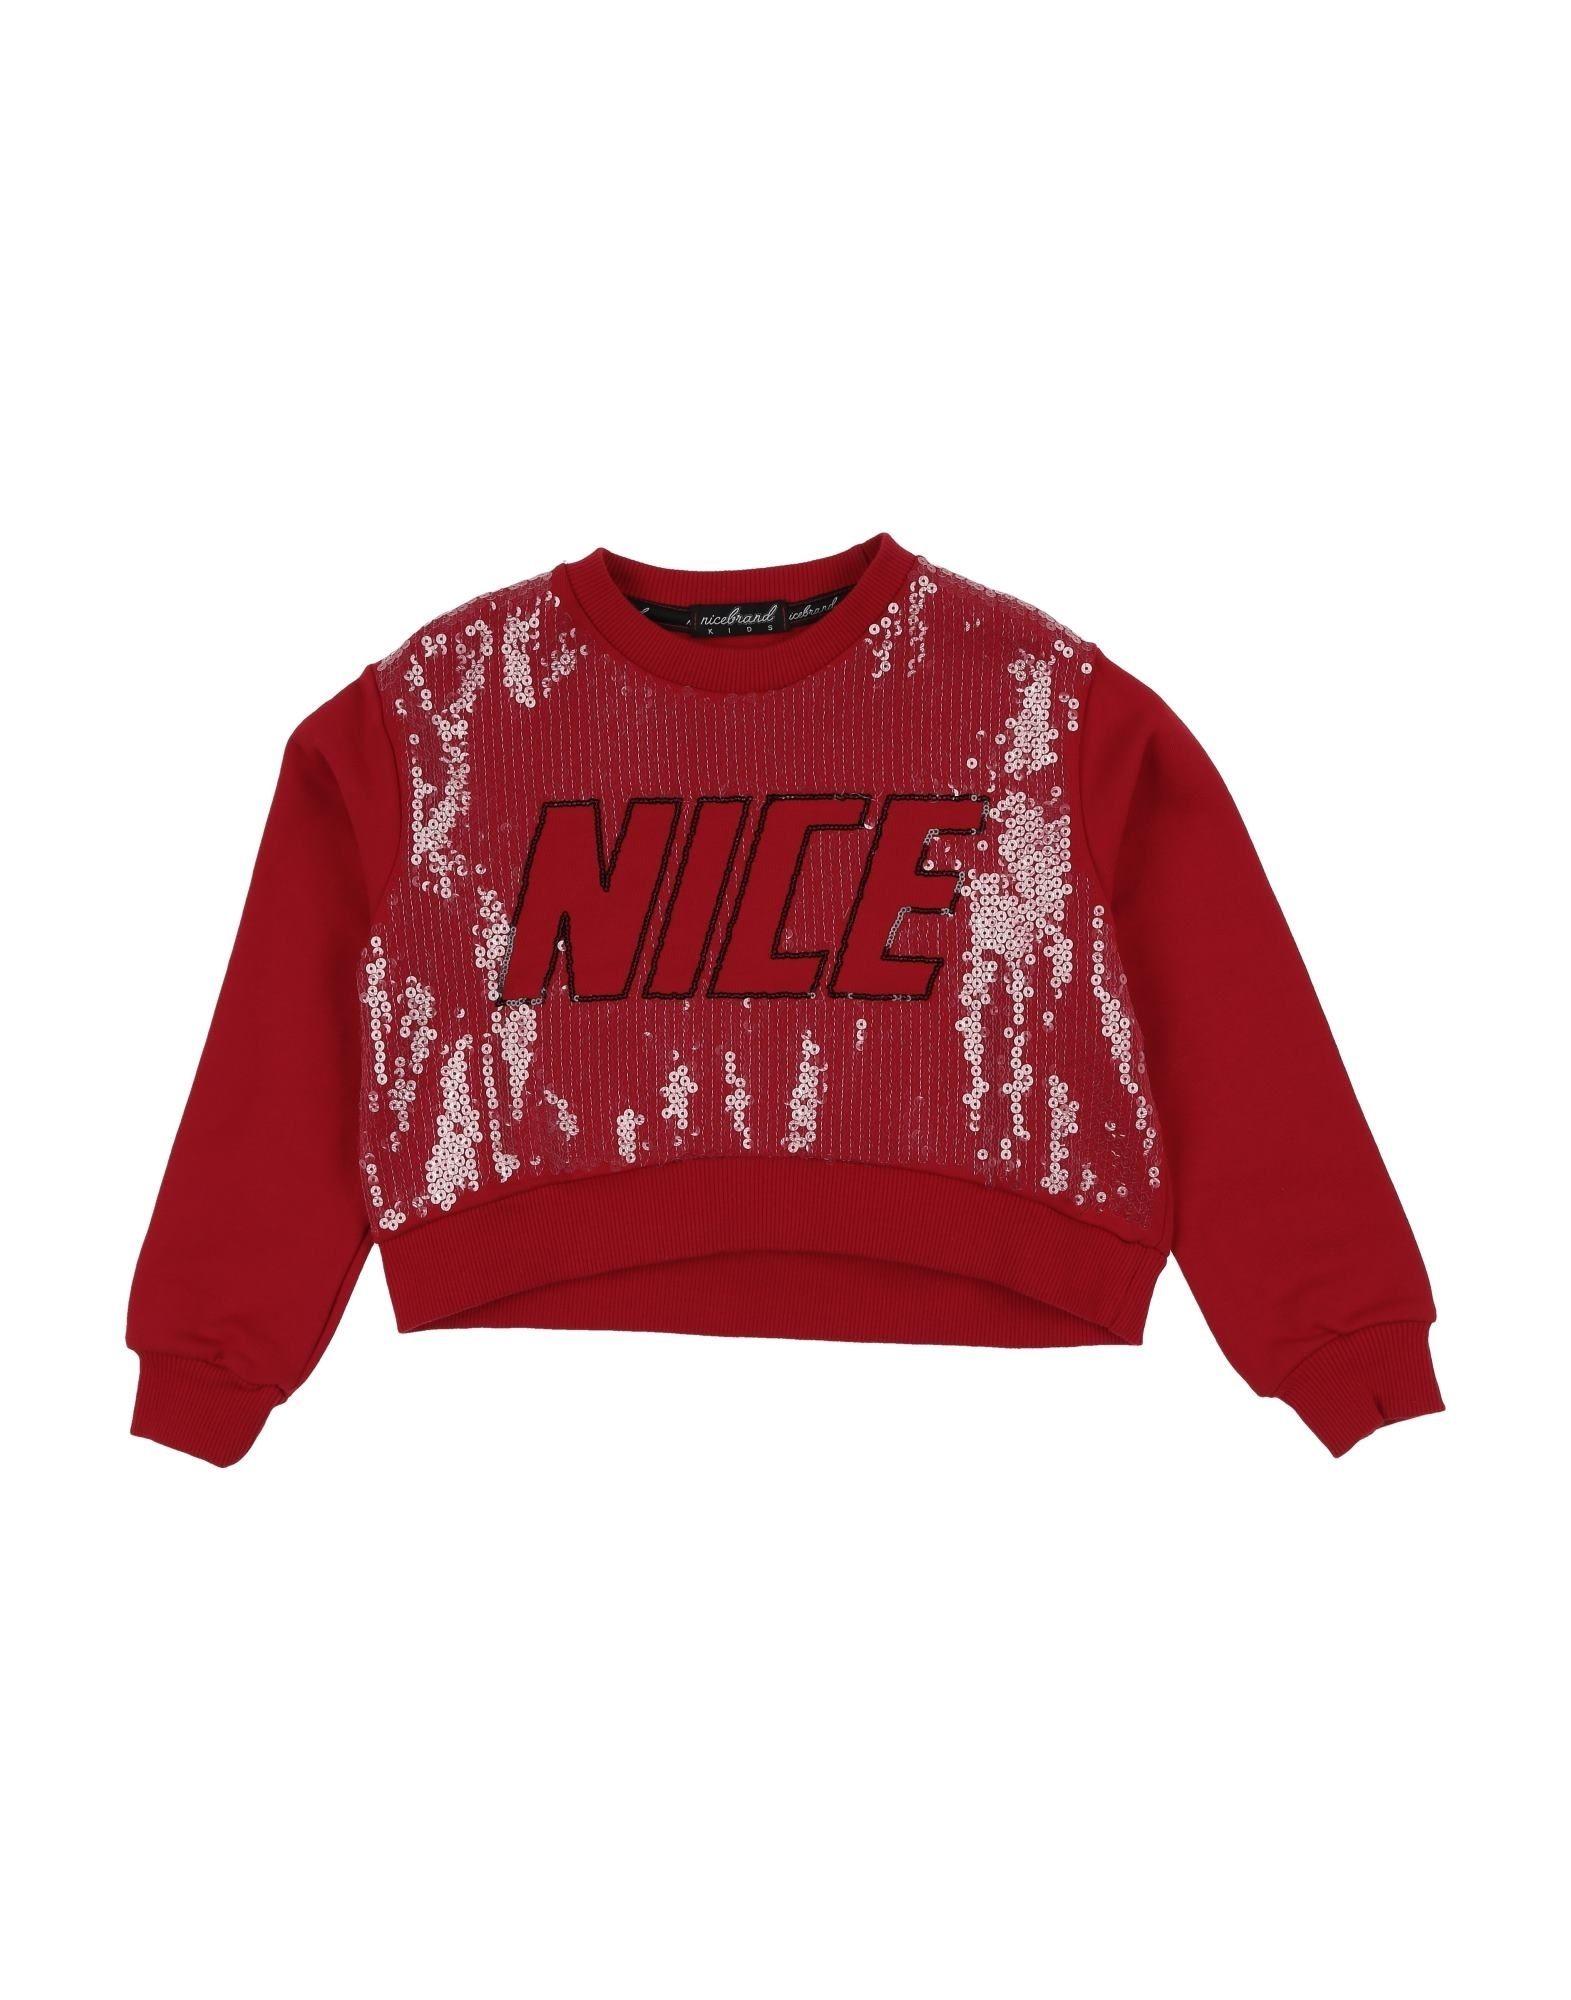 Nicebrand Kids' Sweatshirts In Red